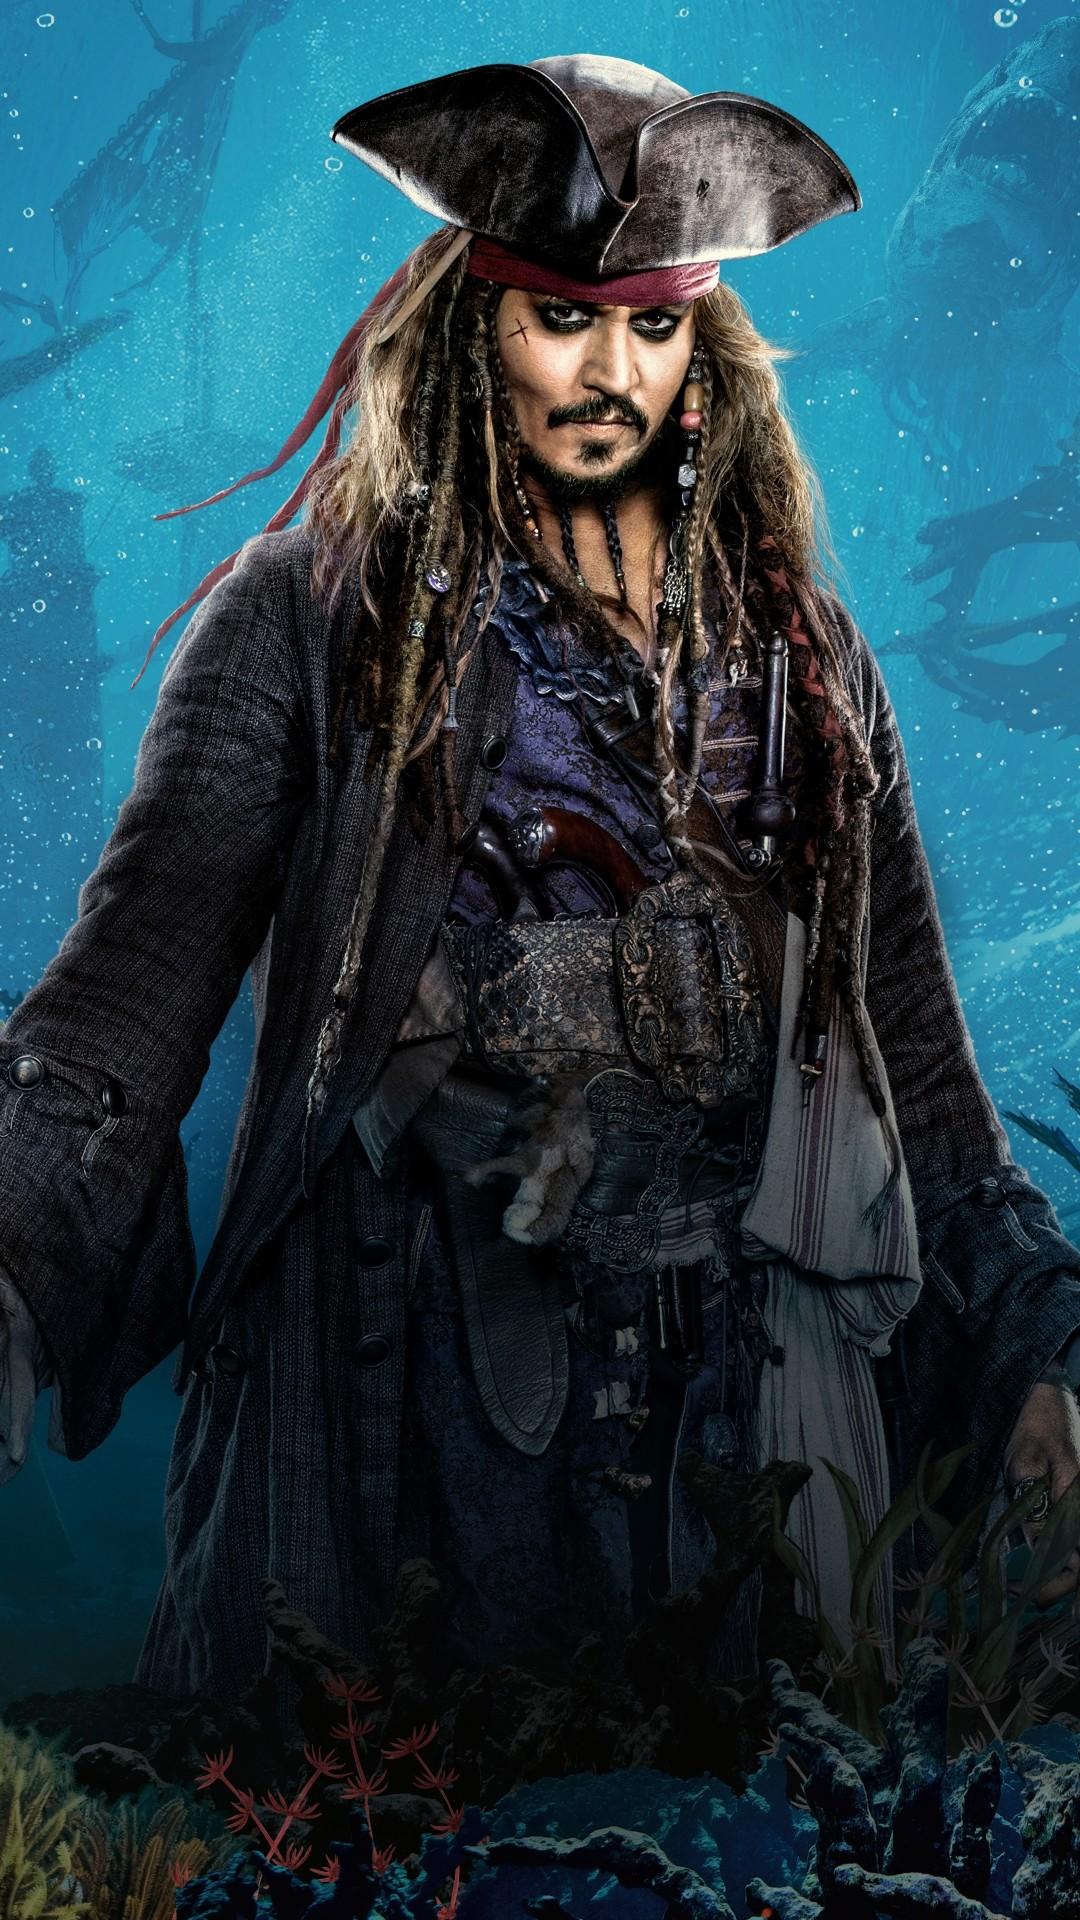 3d My Name Live Wallpaper Apk Download Jack Sparrow Wallpapers Free Download Many Hd Wallpaper